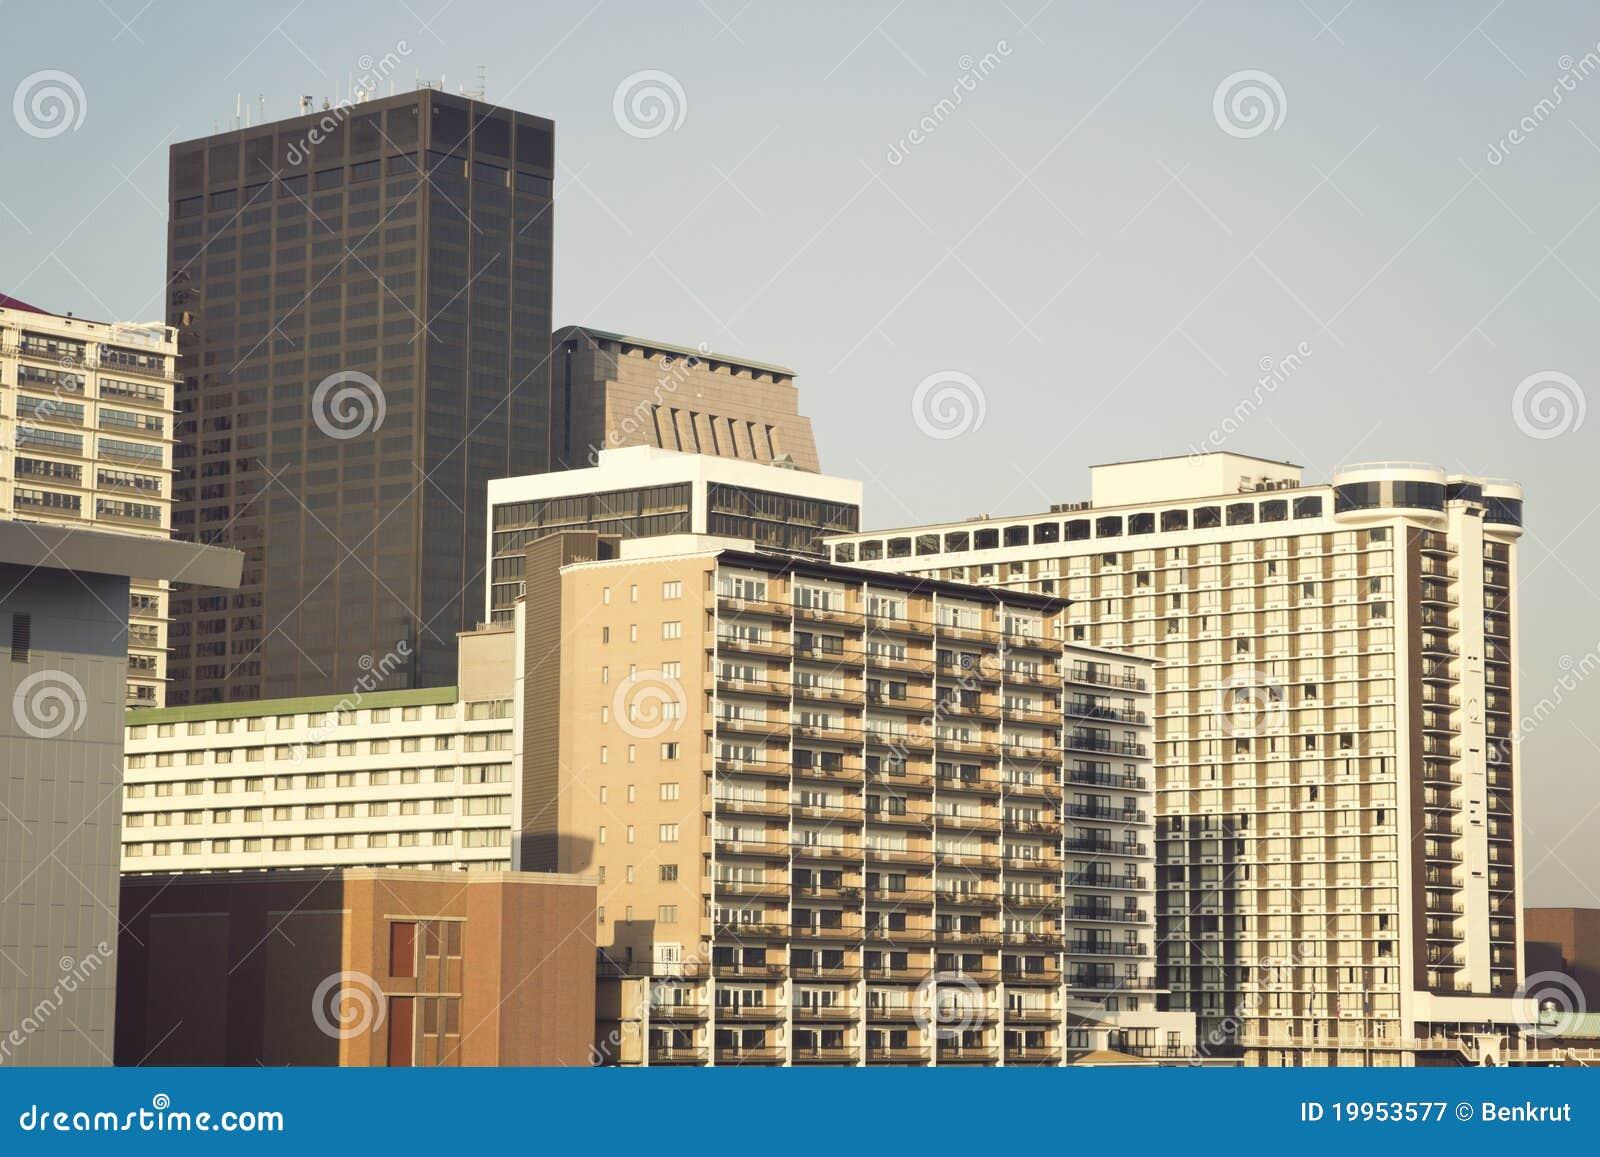 Louisville buildings